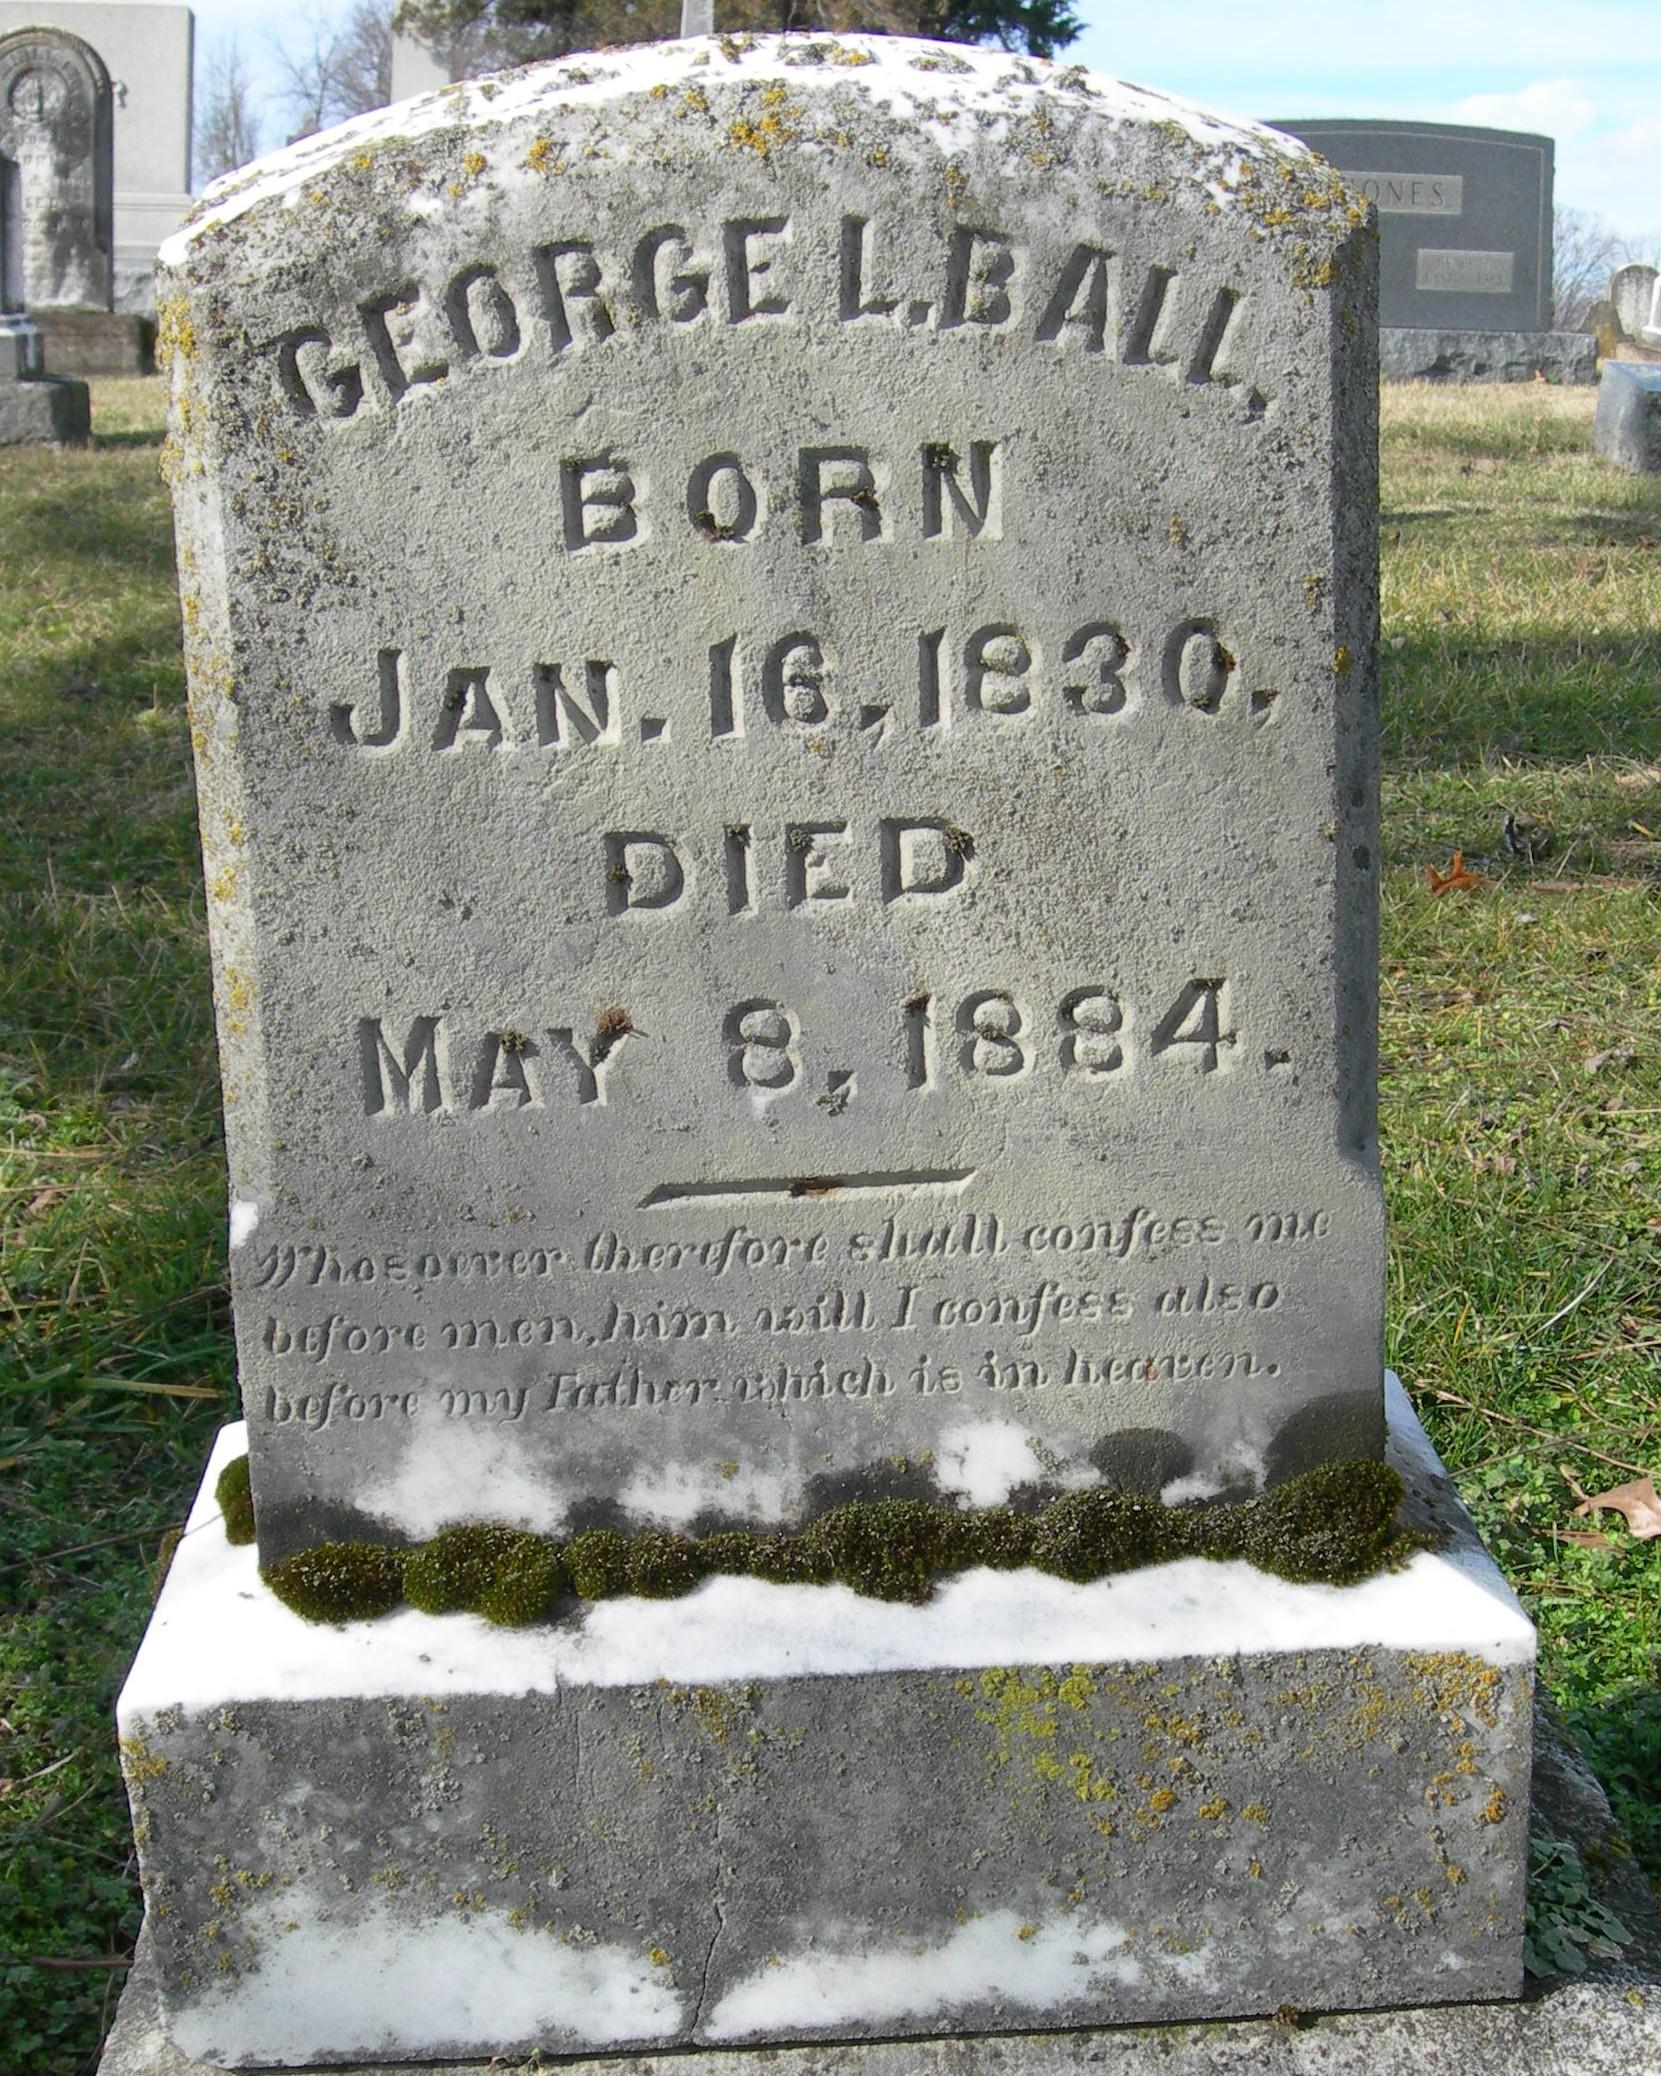 Guard George L. Ball | Kentucky Department of Corrections, Kentucky